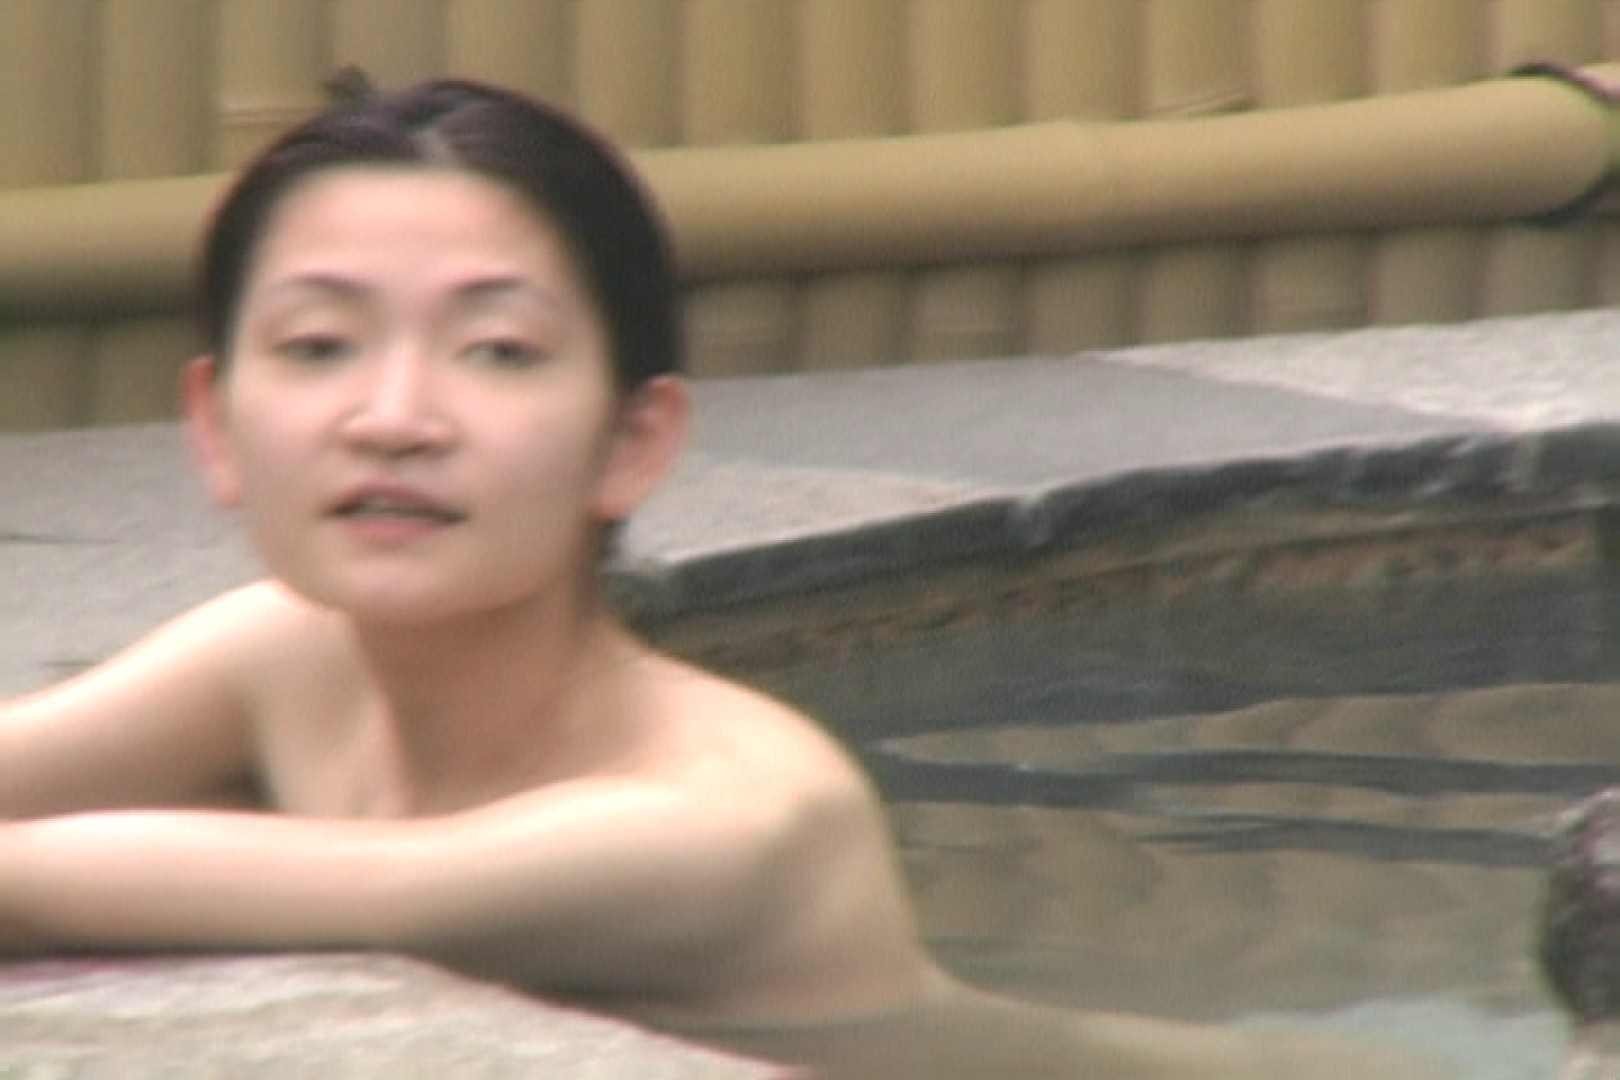 Aquaな露天風呂Vol.637 盗撮  50連発 27